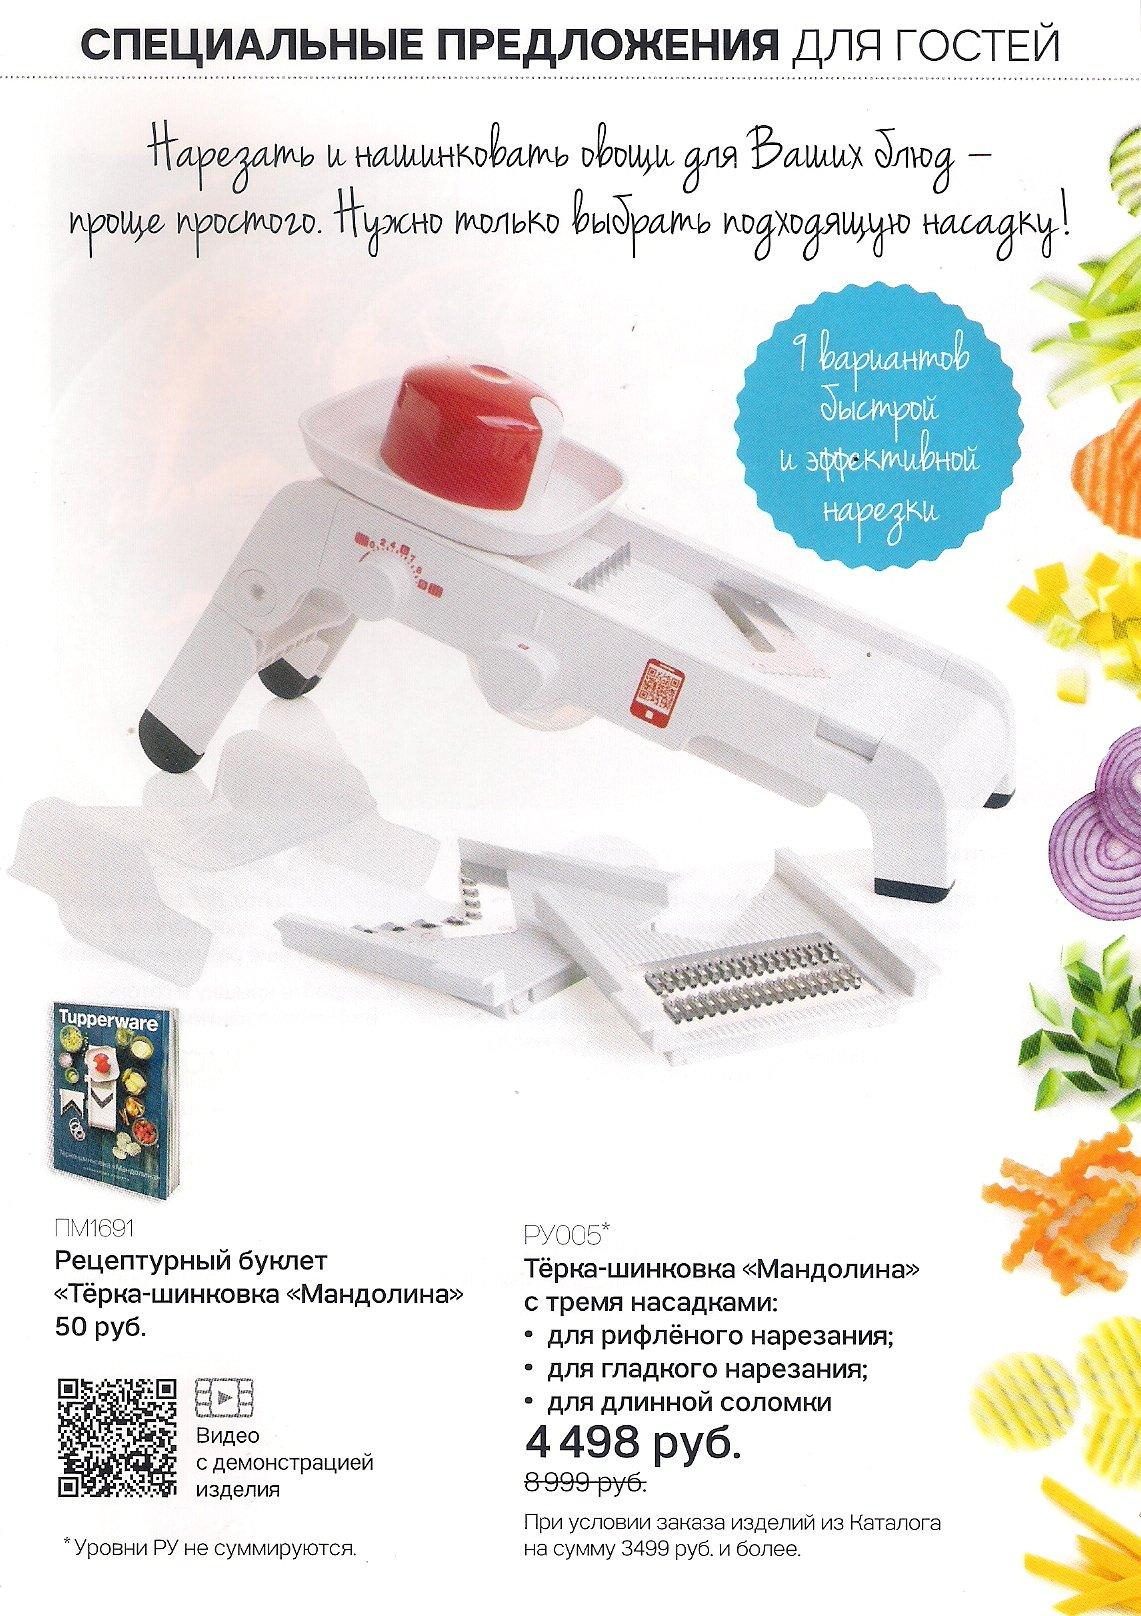 http://tupperware-online.ru/images/upload/11g.jpg